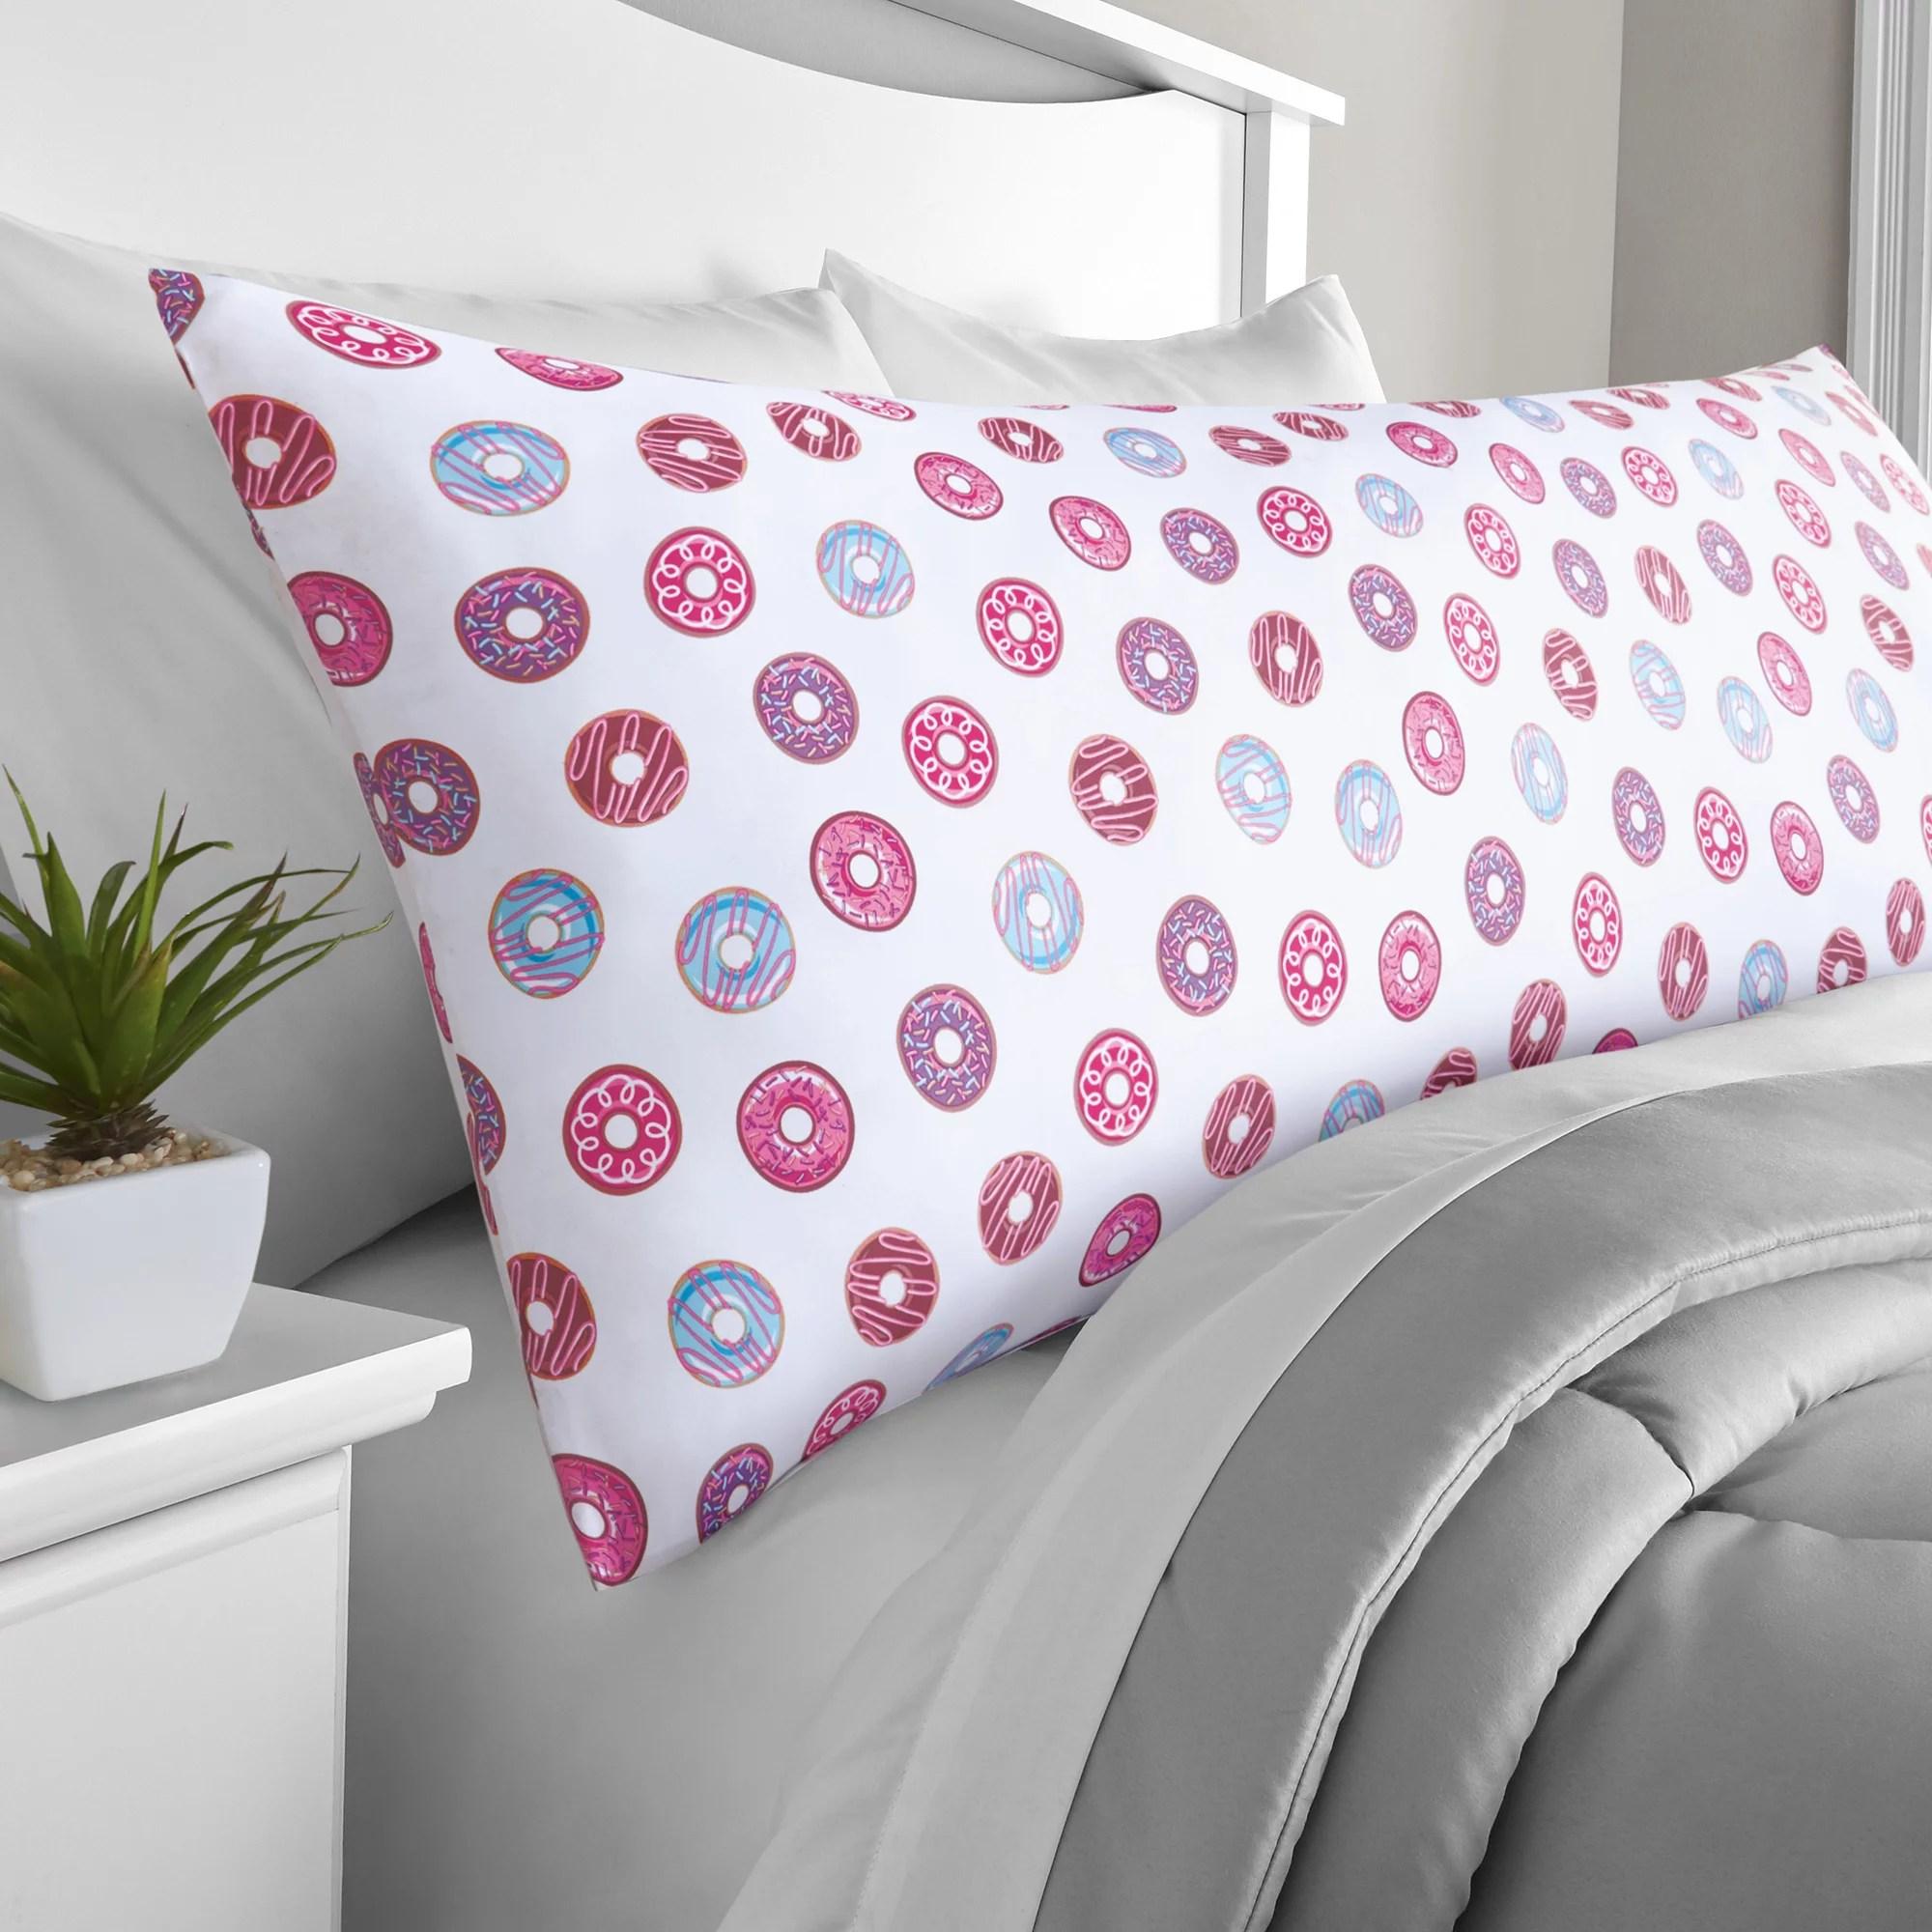 mainstays microfiber 20 x 52 donut body pillow cover 1 each